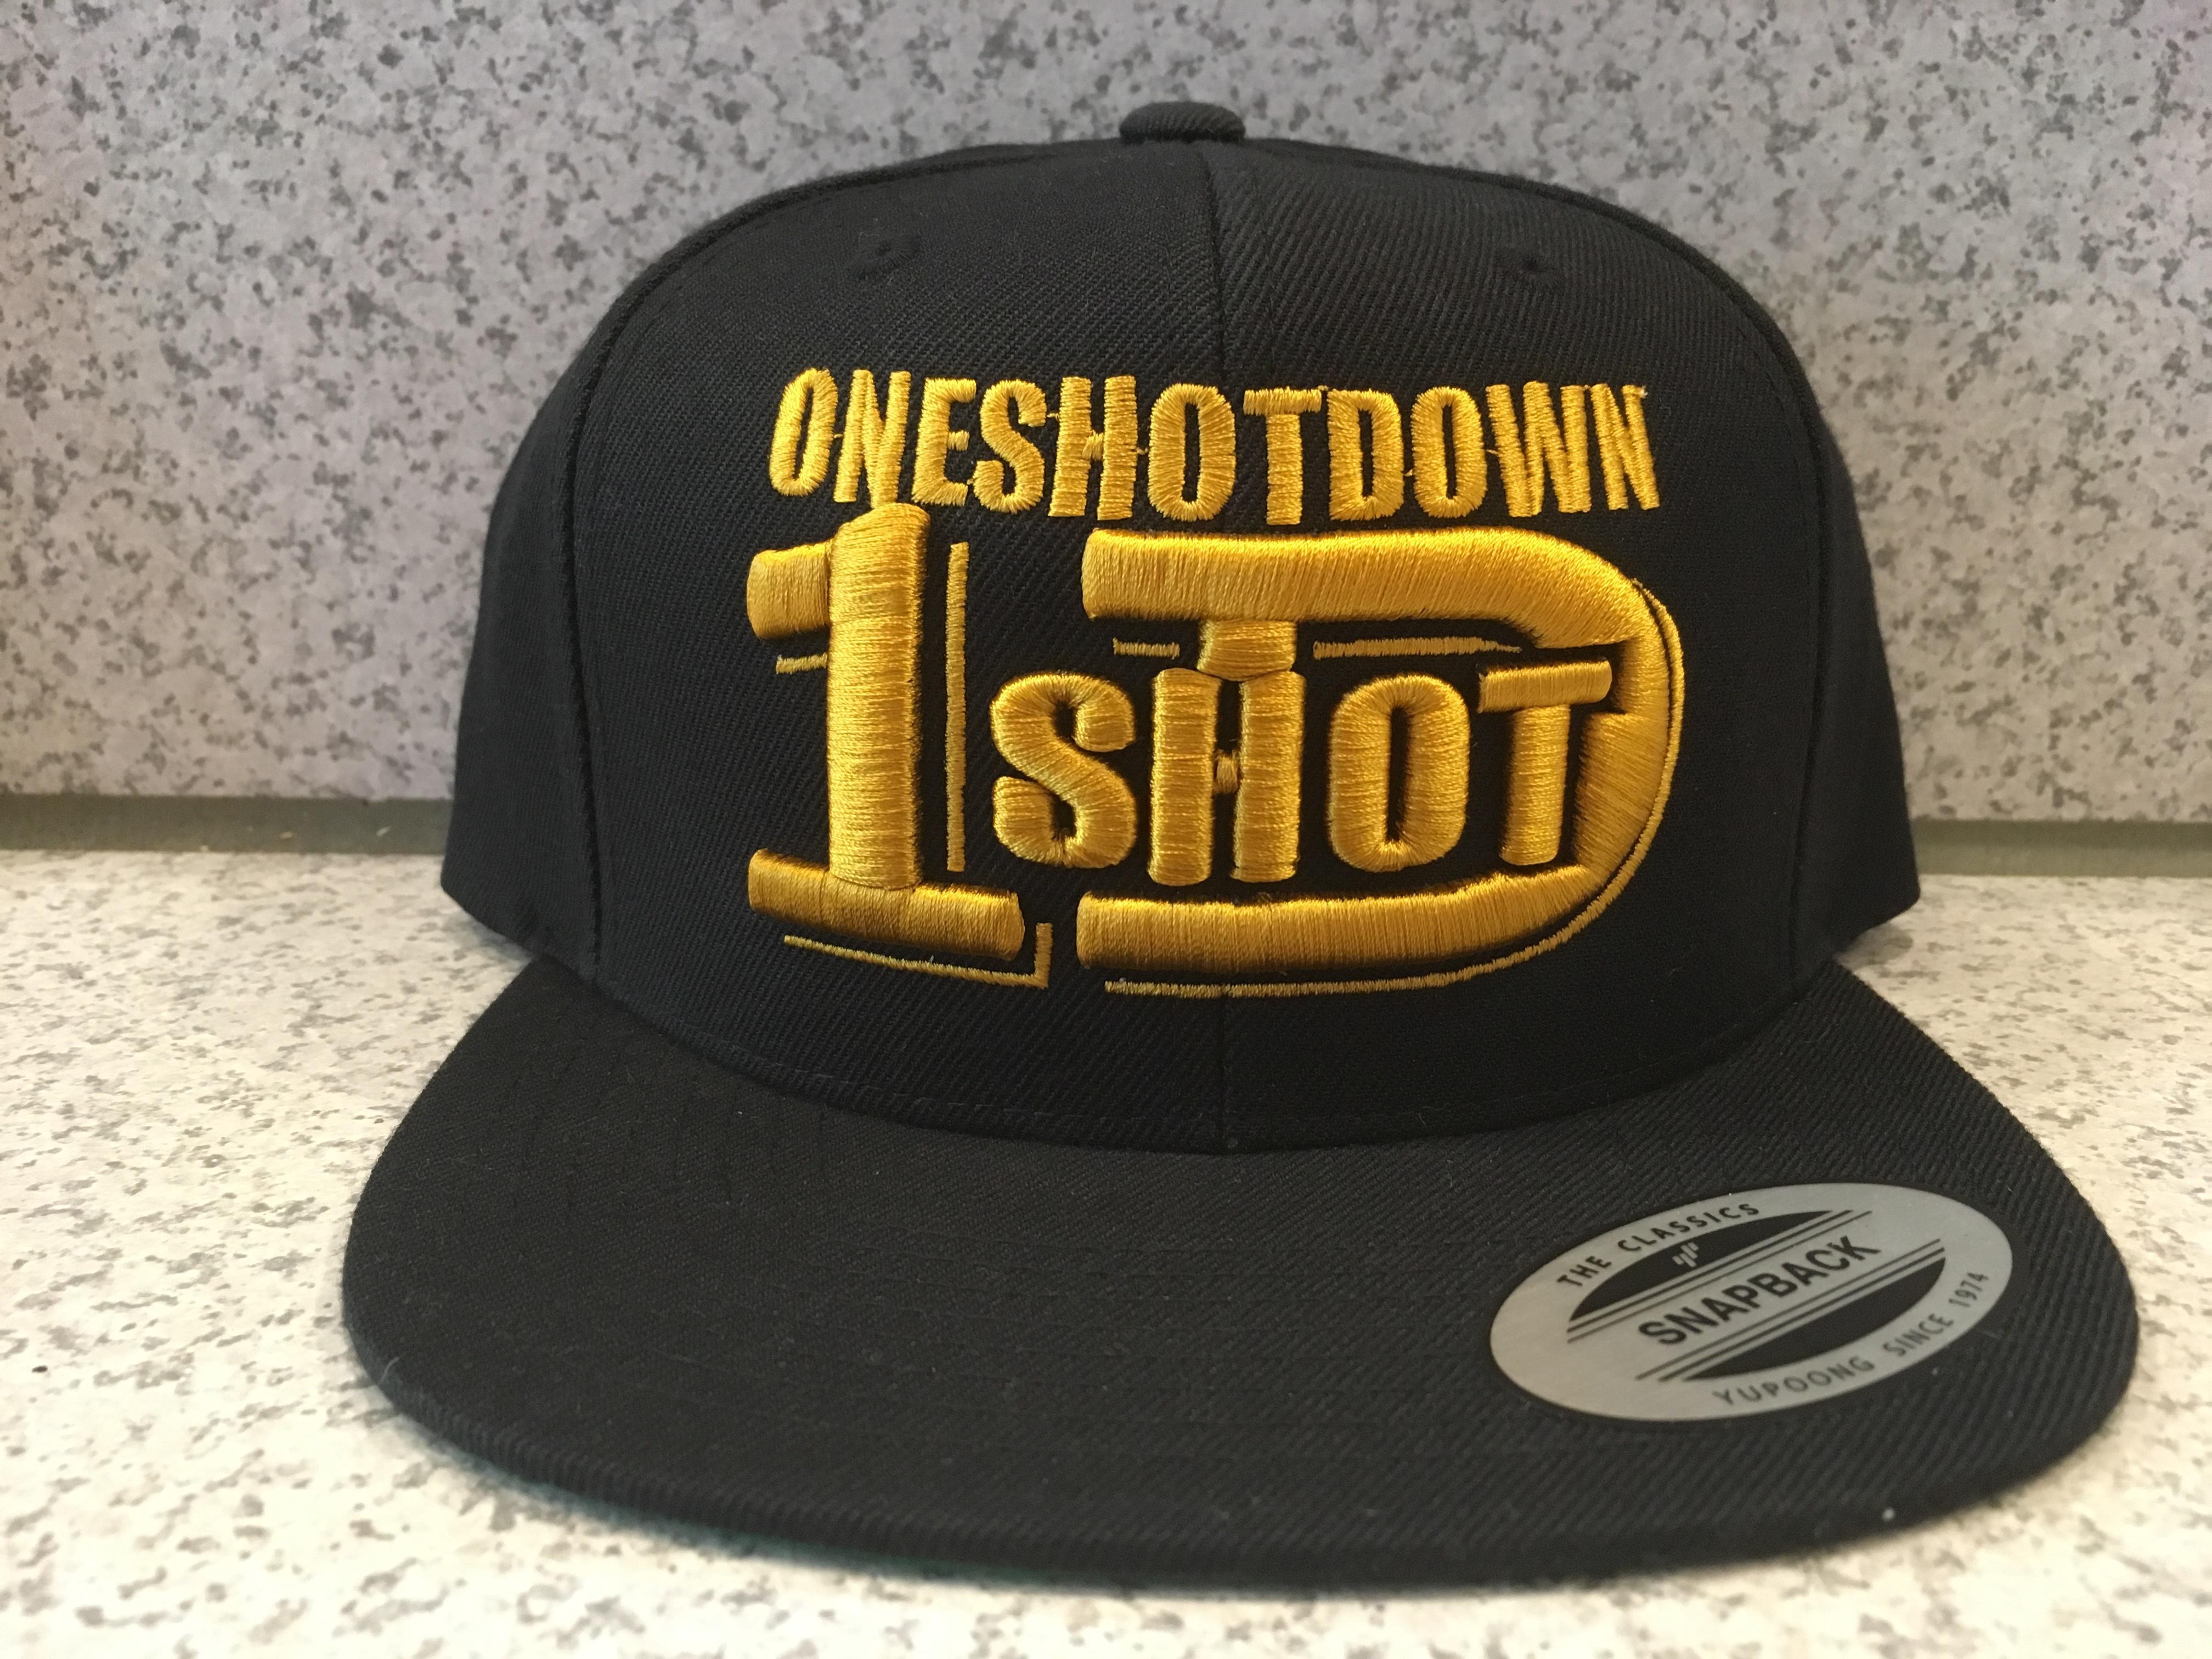 ONESHOTDOWNロゴ3D刺繍CAP - 画像2